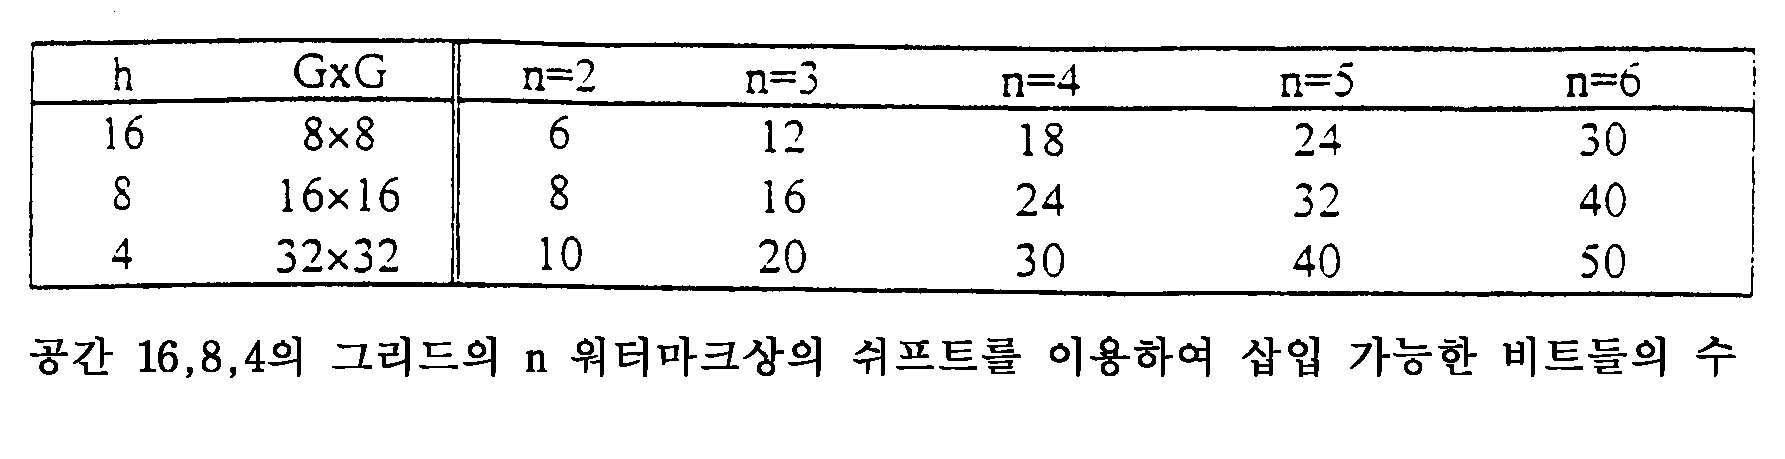 Figure 111999014177864-pct00015